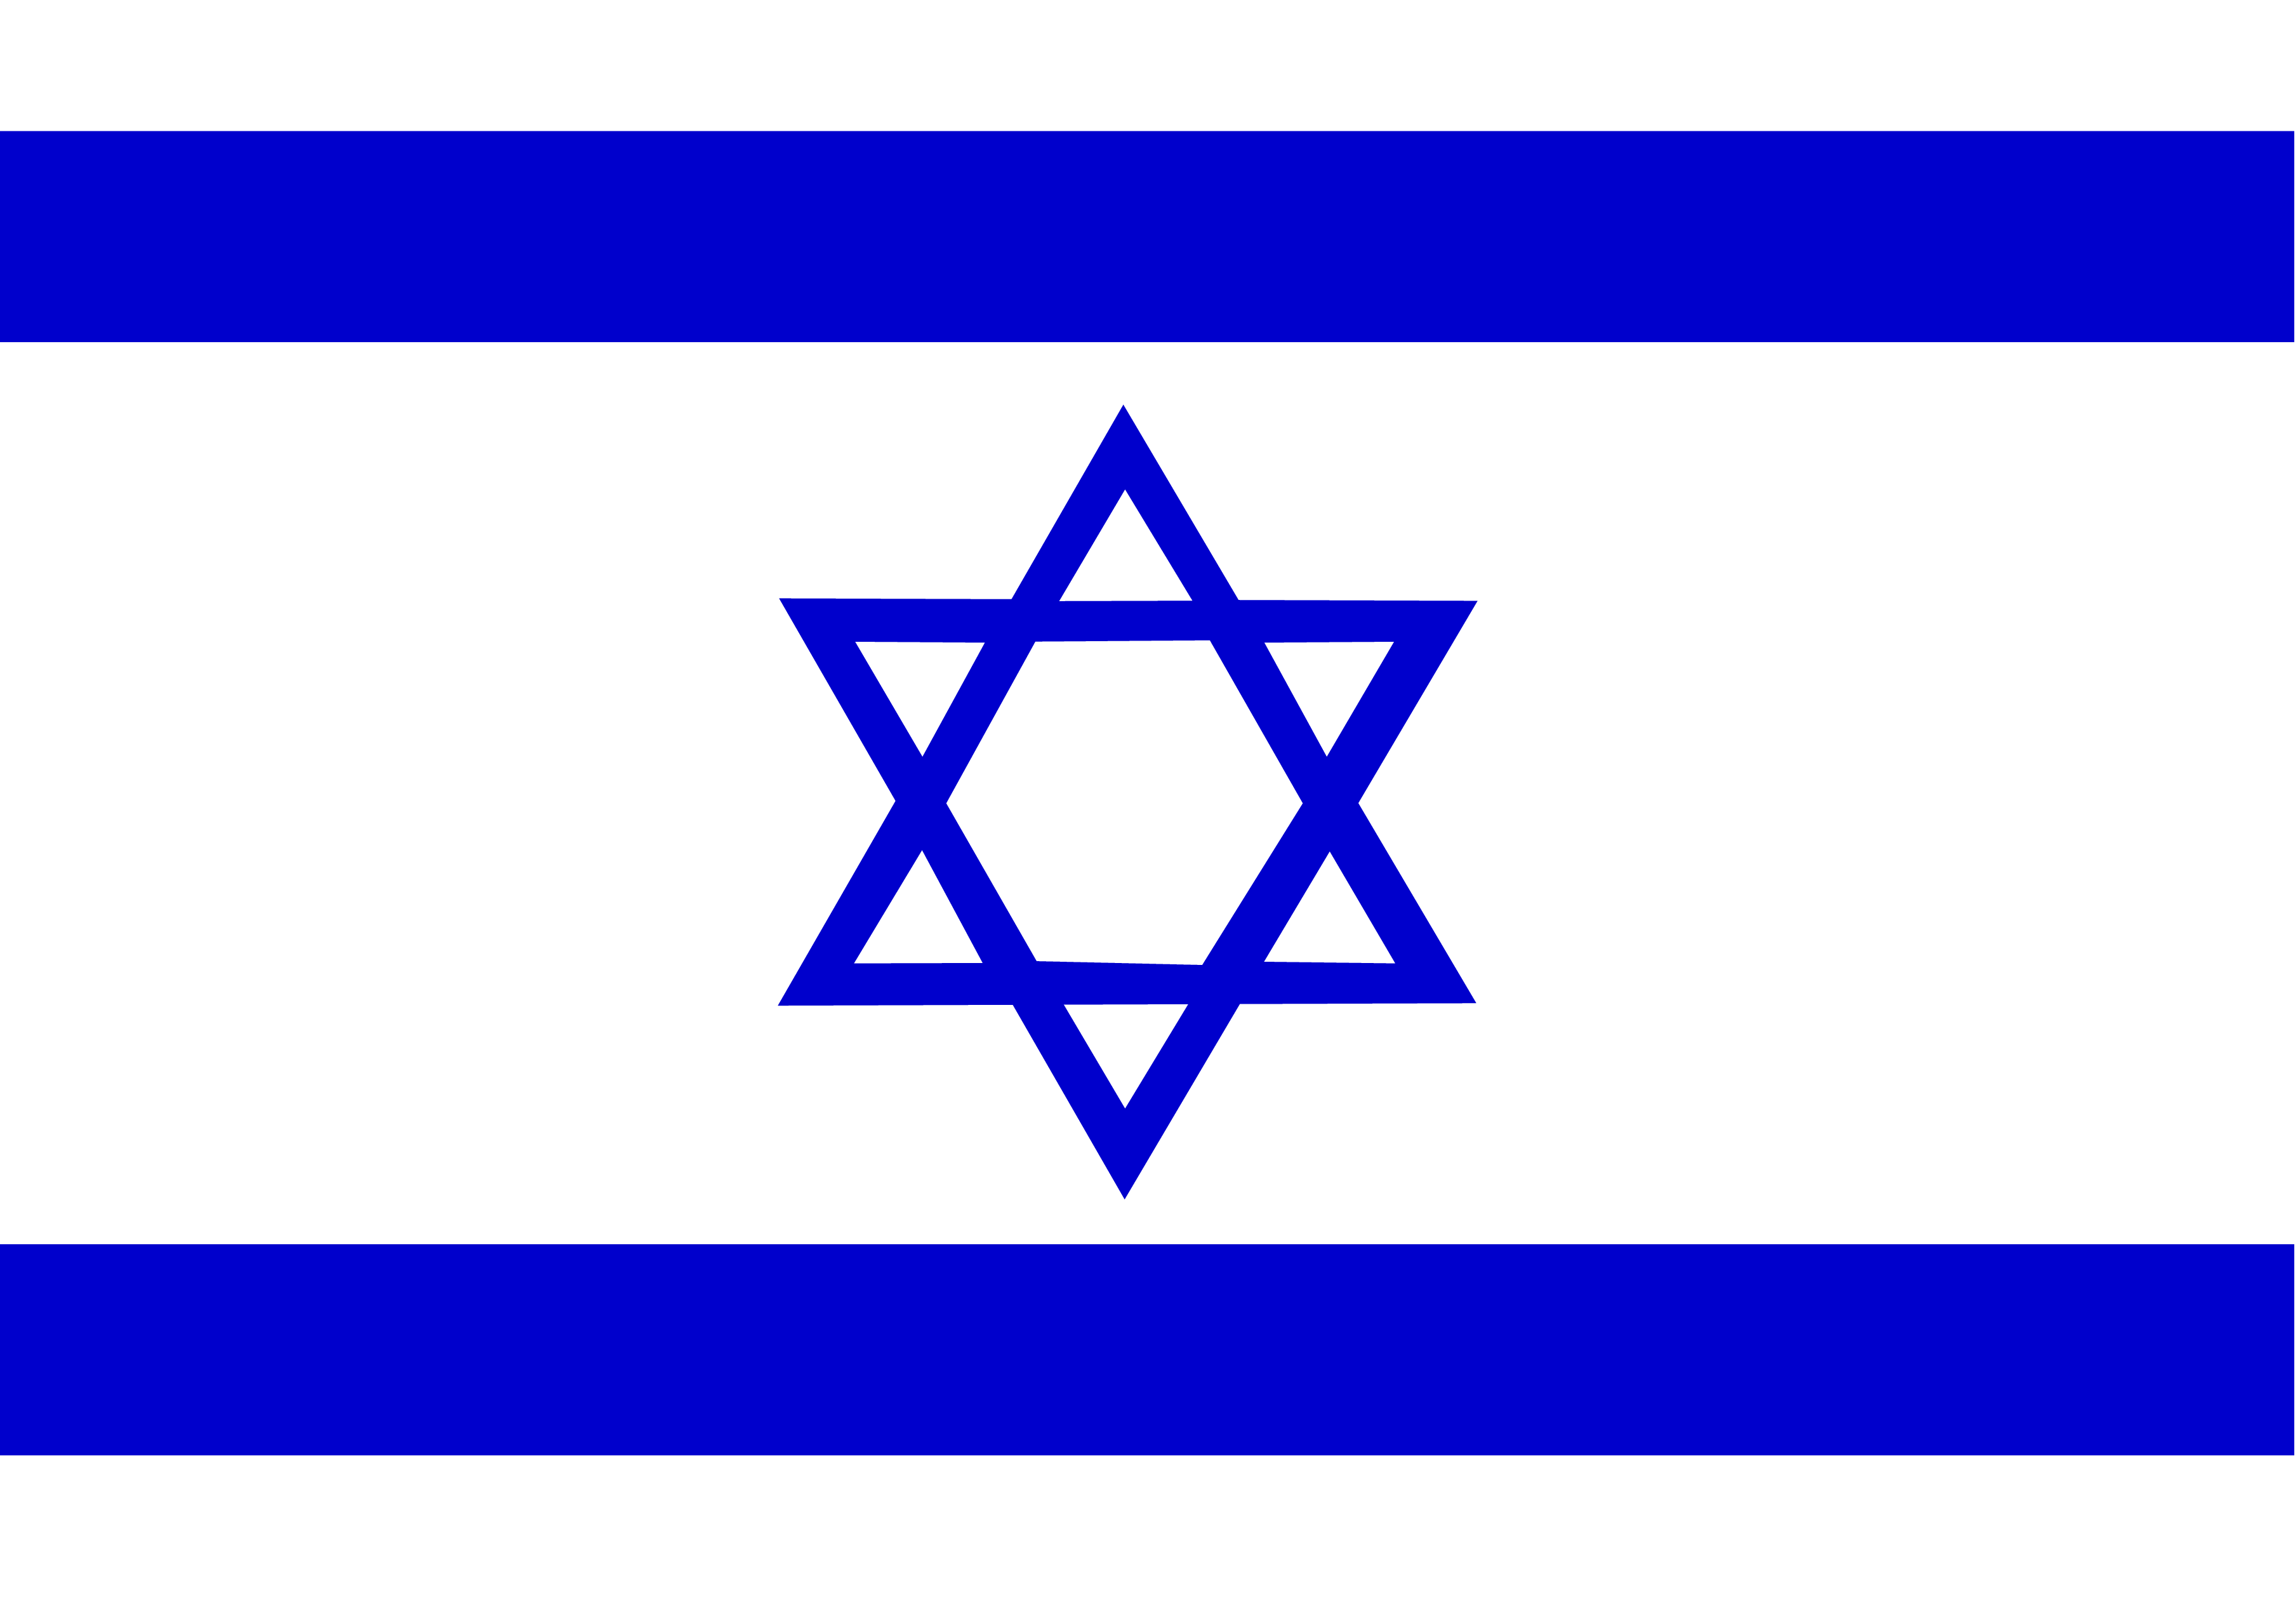 Israel Flag Free Images At Clker Com Vector Clip Art Online Royalty Free Public Domain Israeli Flag Israel Flag Jewish Symbols